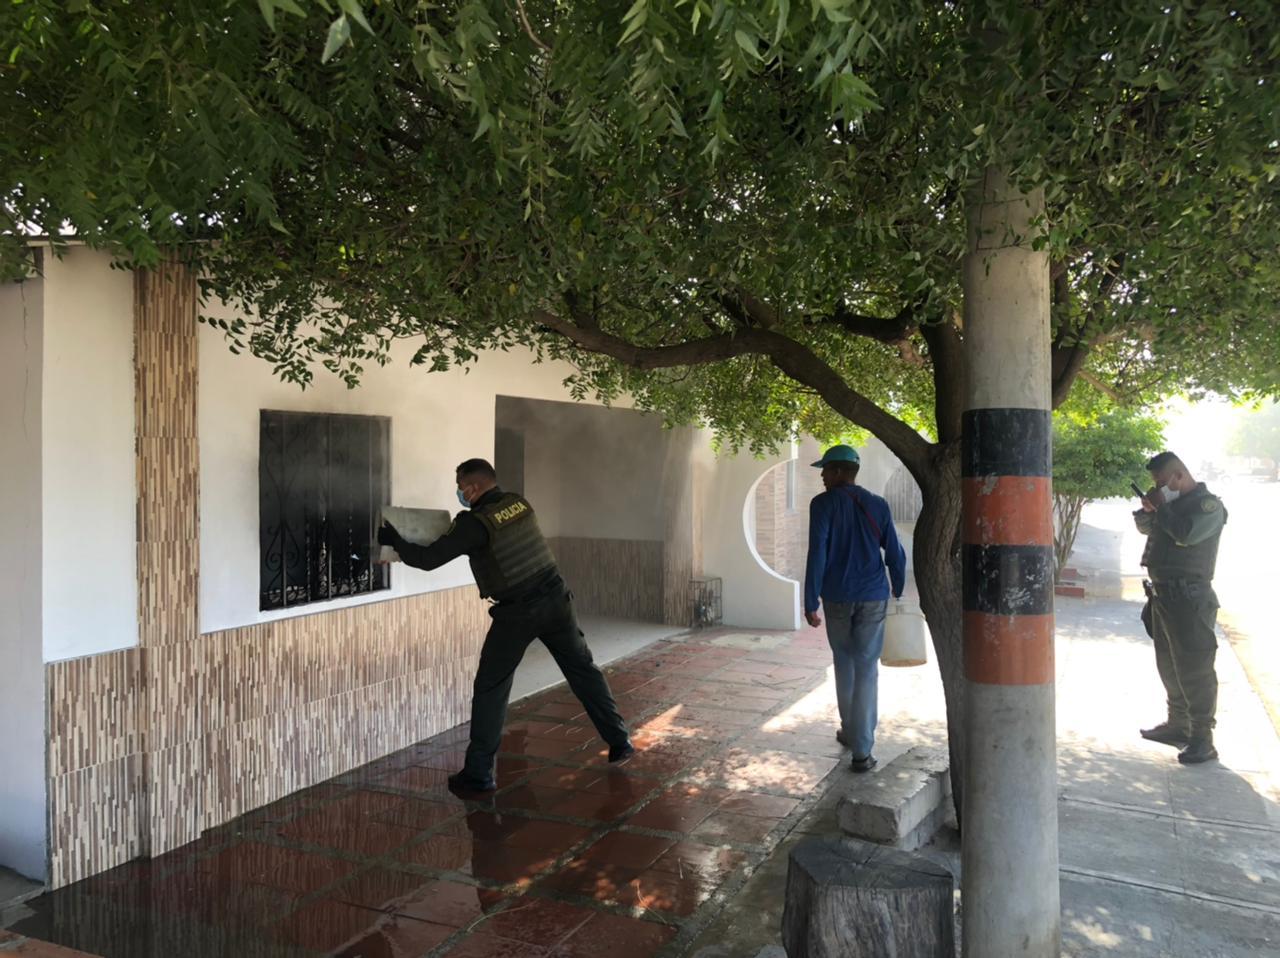 hoyennoticia.com, Policía evitó incendio en Maicao